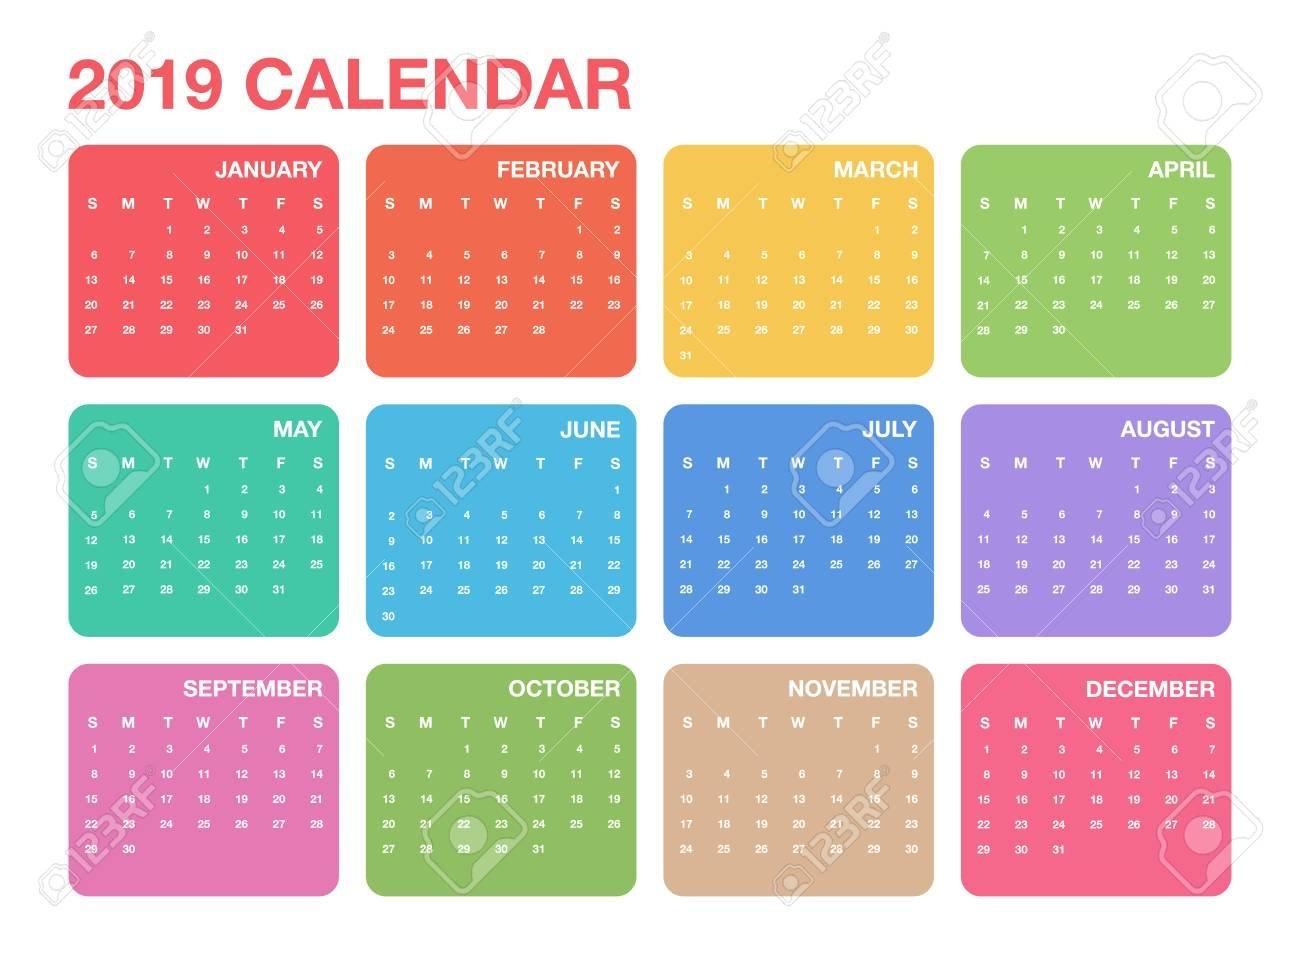 Calendar 2019 Template. Colorful Calendar Design For Planner Design A Calendar 2019